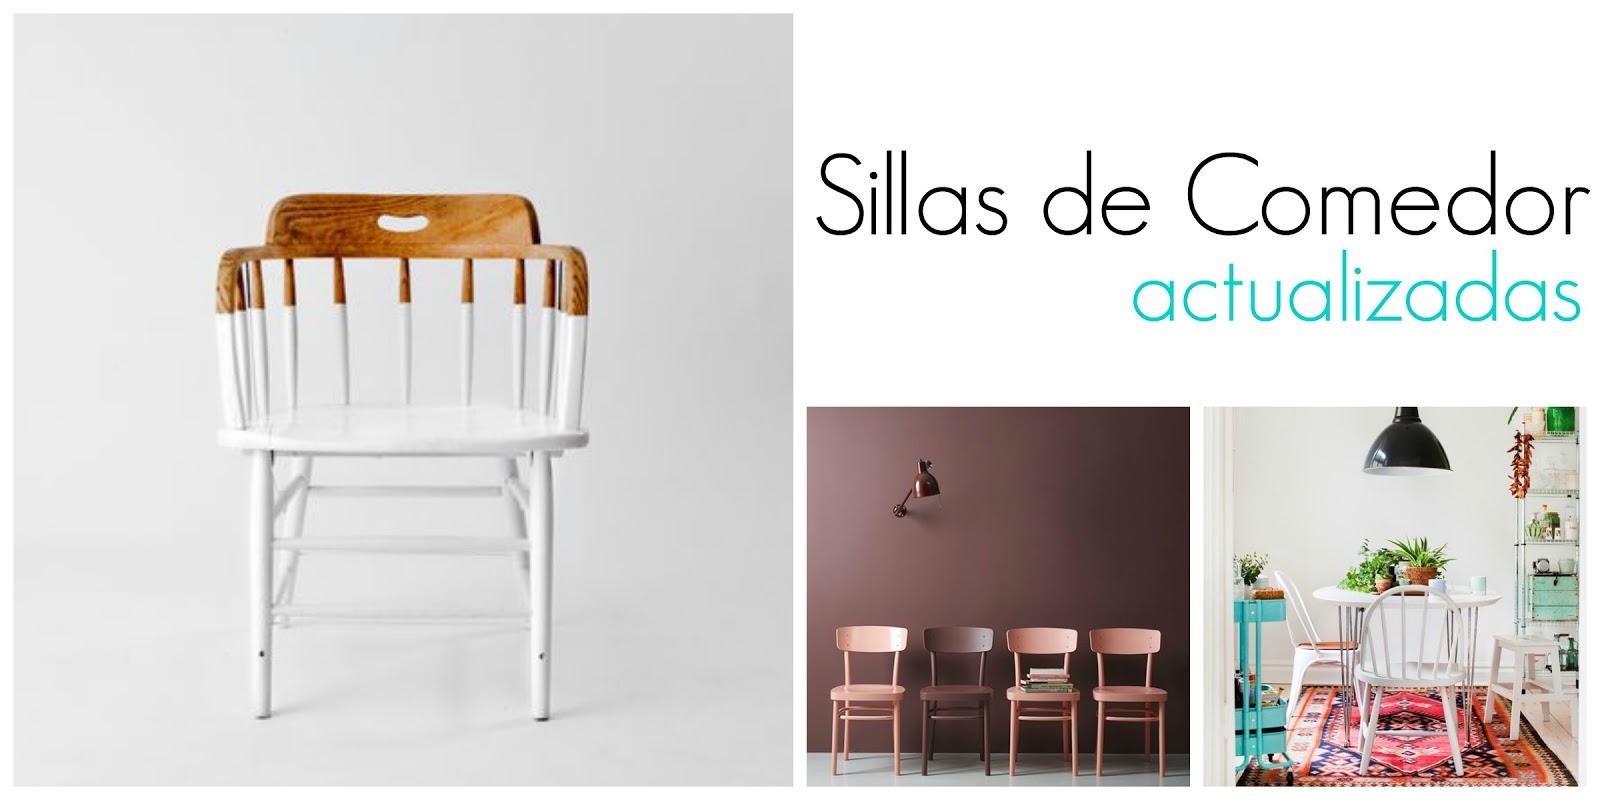 Inspiraci n sillas de comedor actualizadas for Sillas de comedor 2016